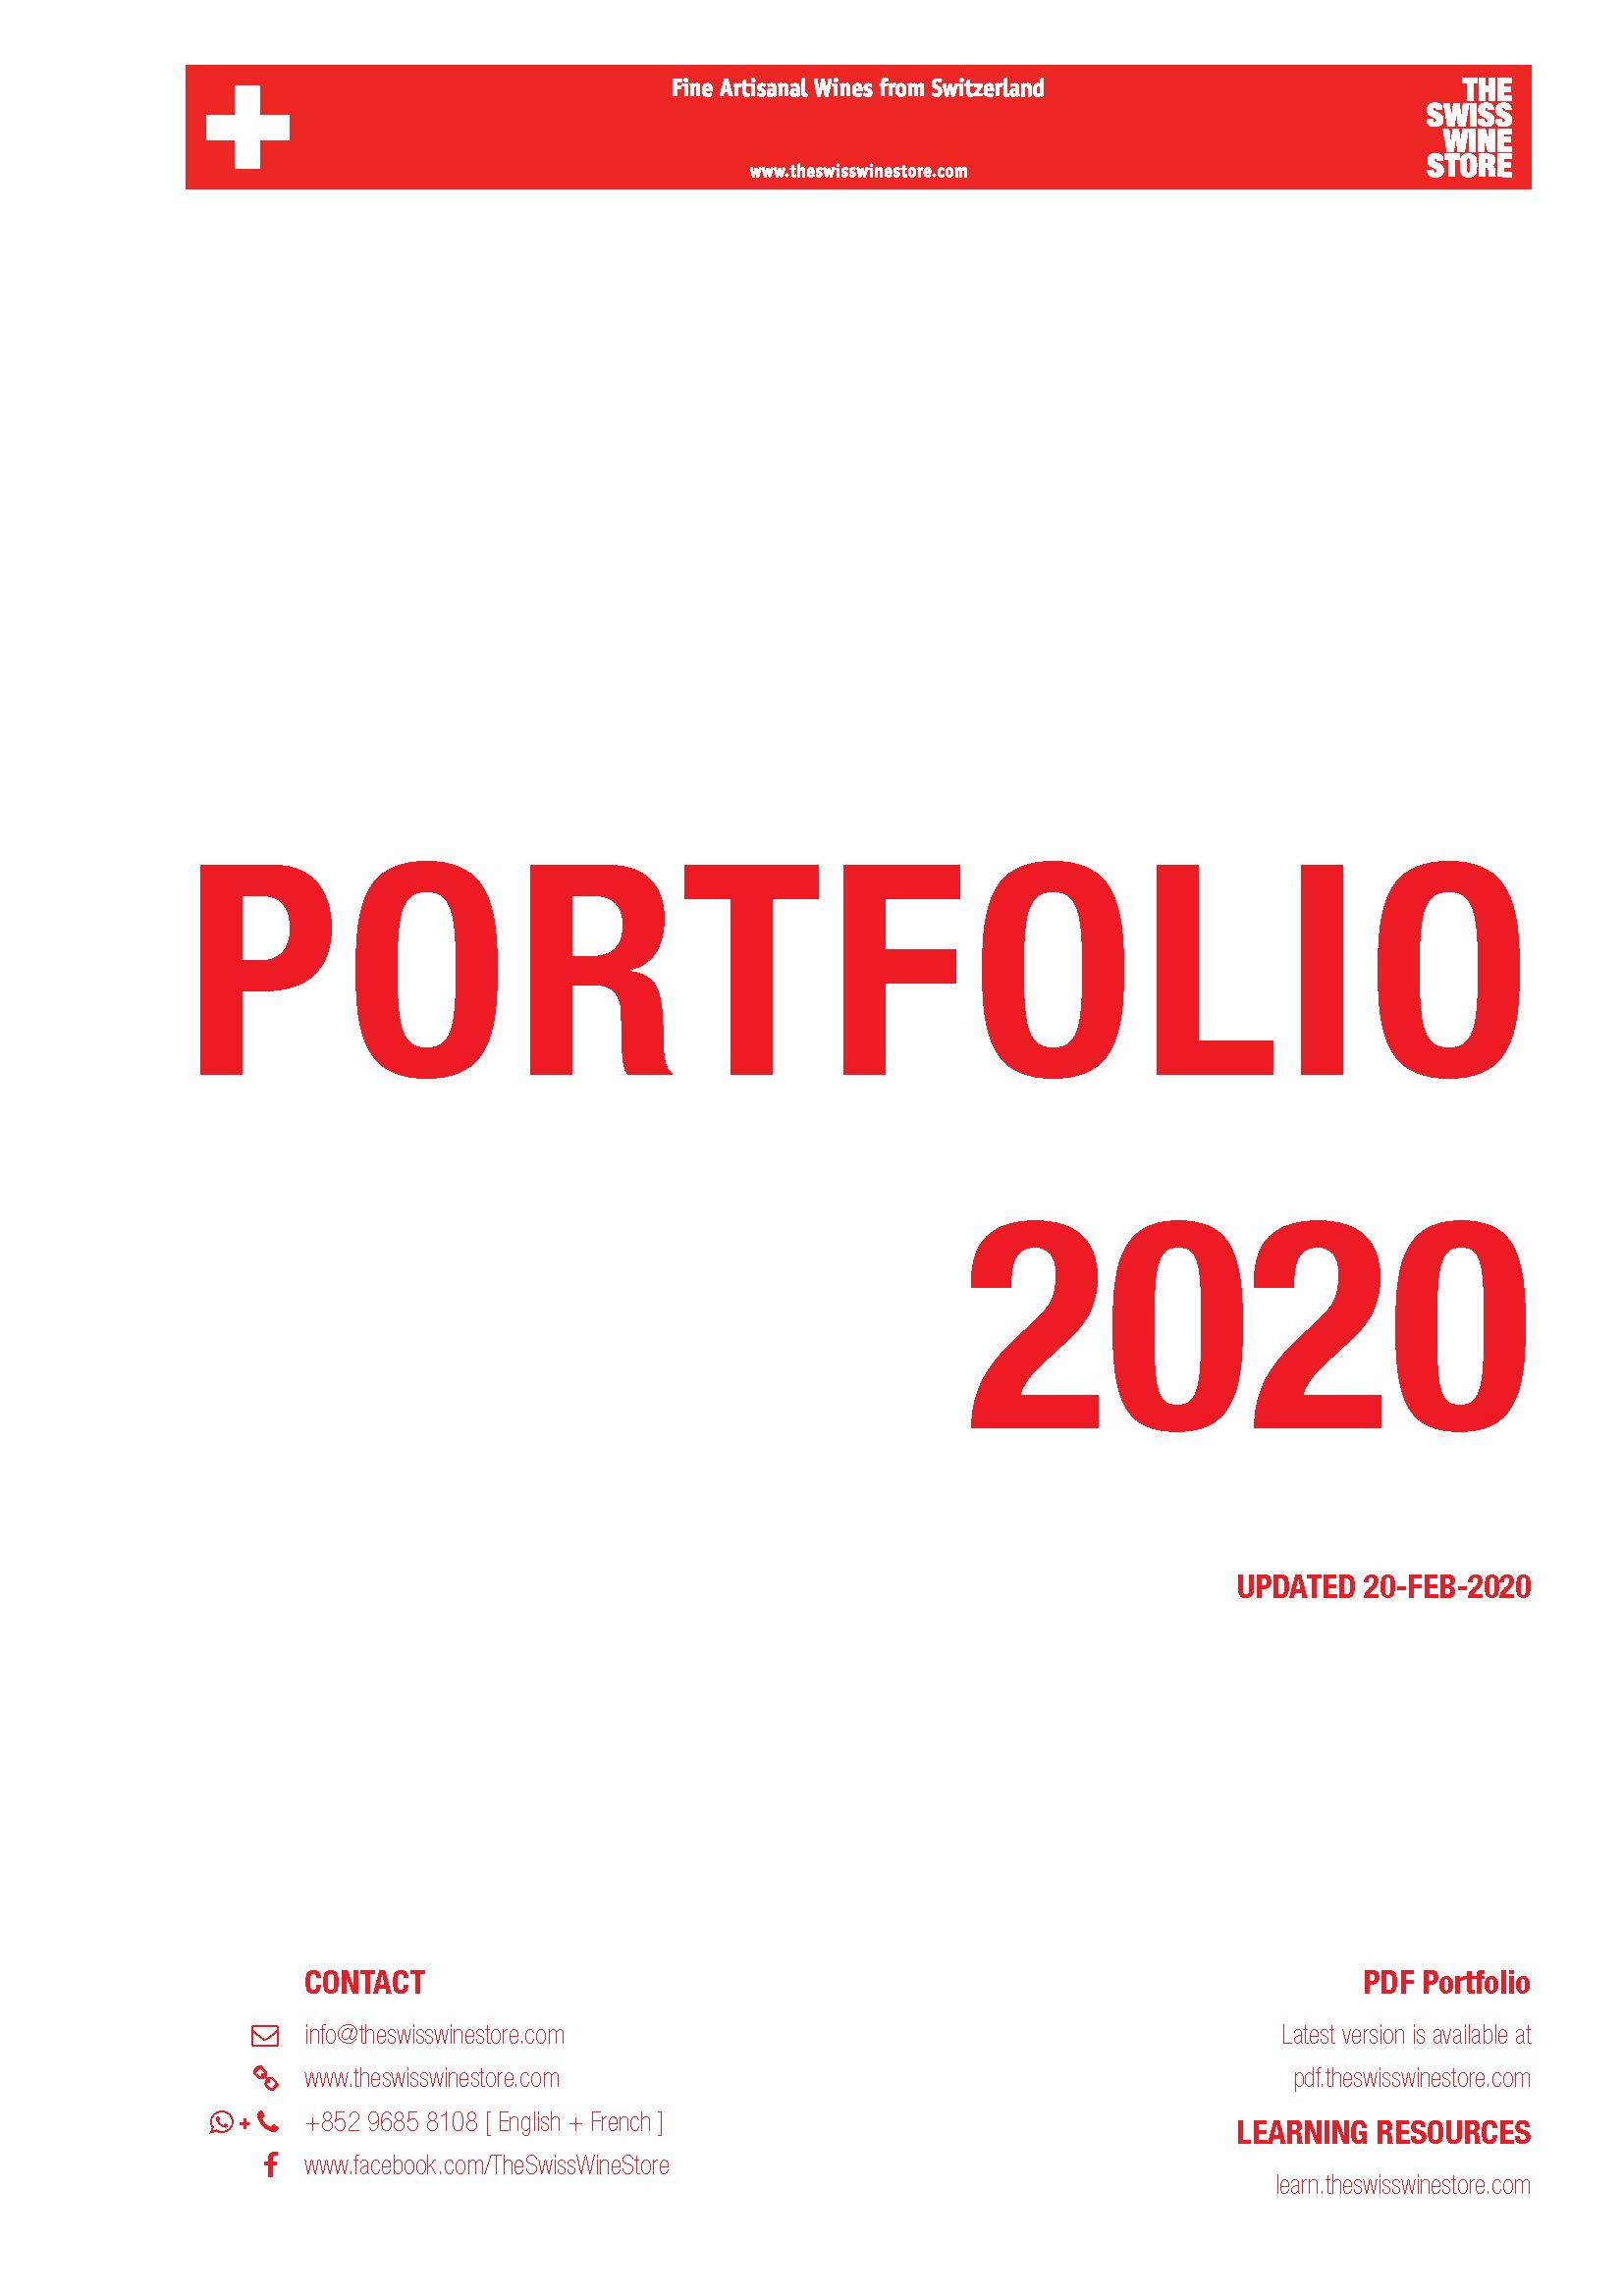 tsws_wine_portfolio_A4_2020-02.png